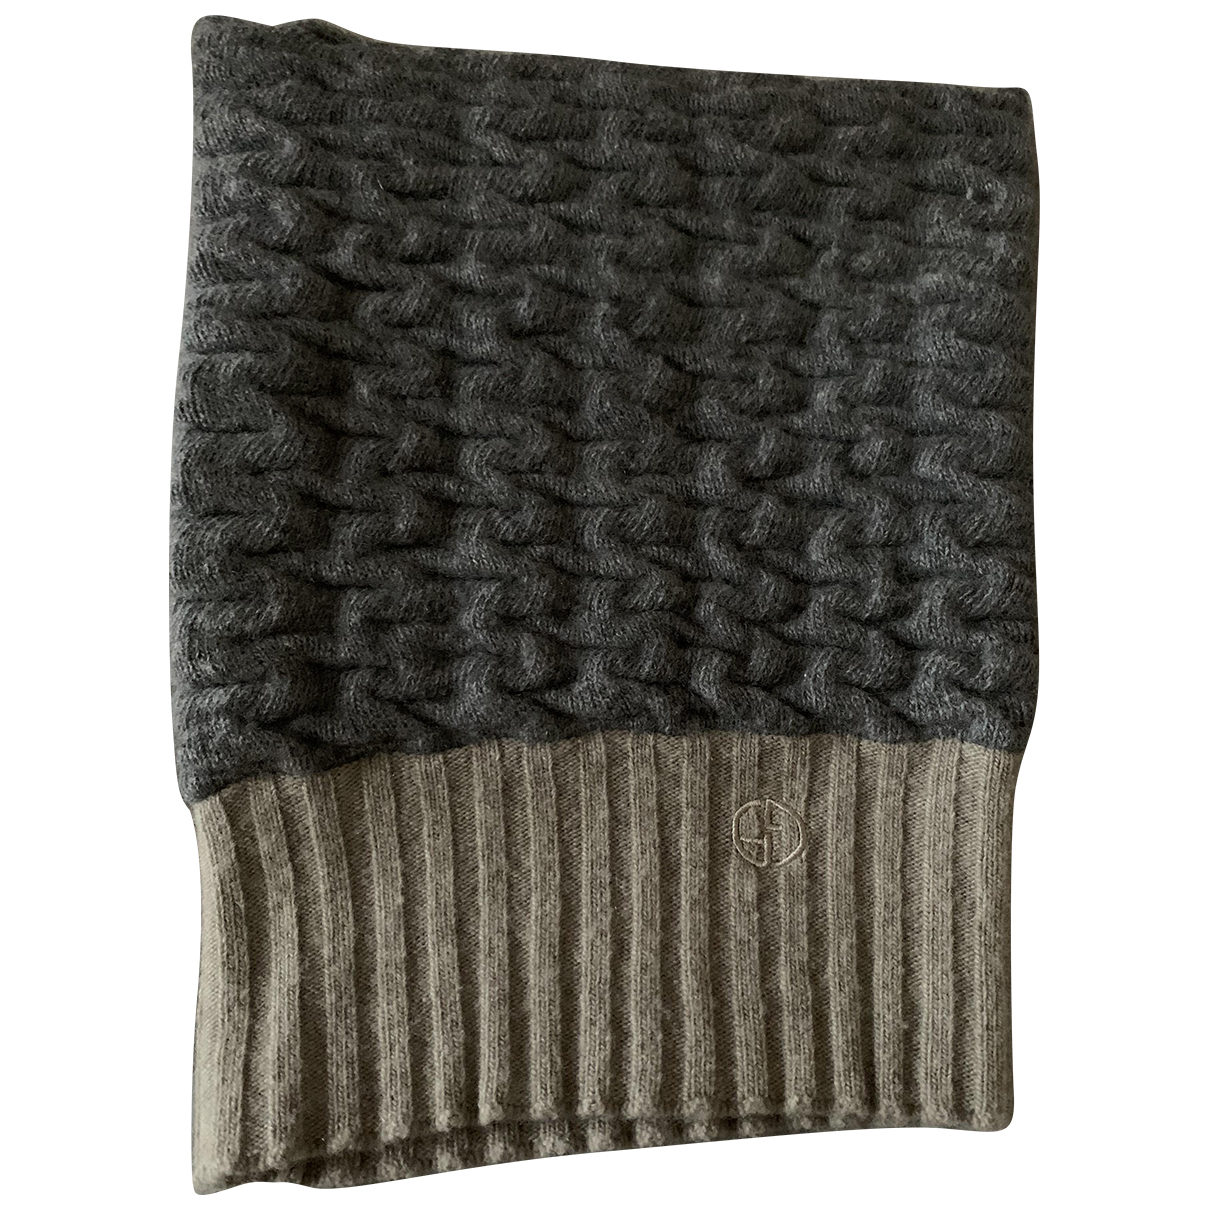 Giorgio Armani N Grey Cashmere scarf & pocket squares for Men N